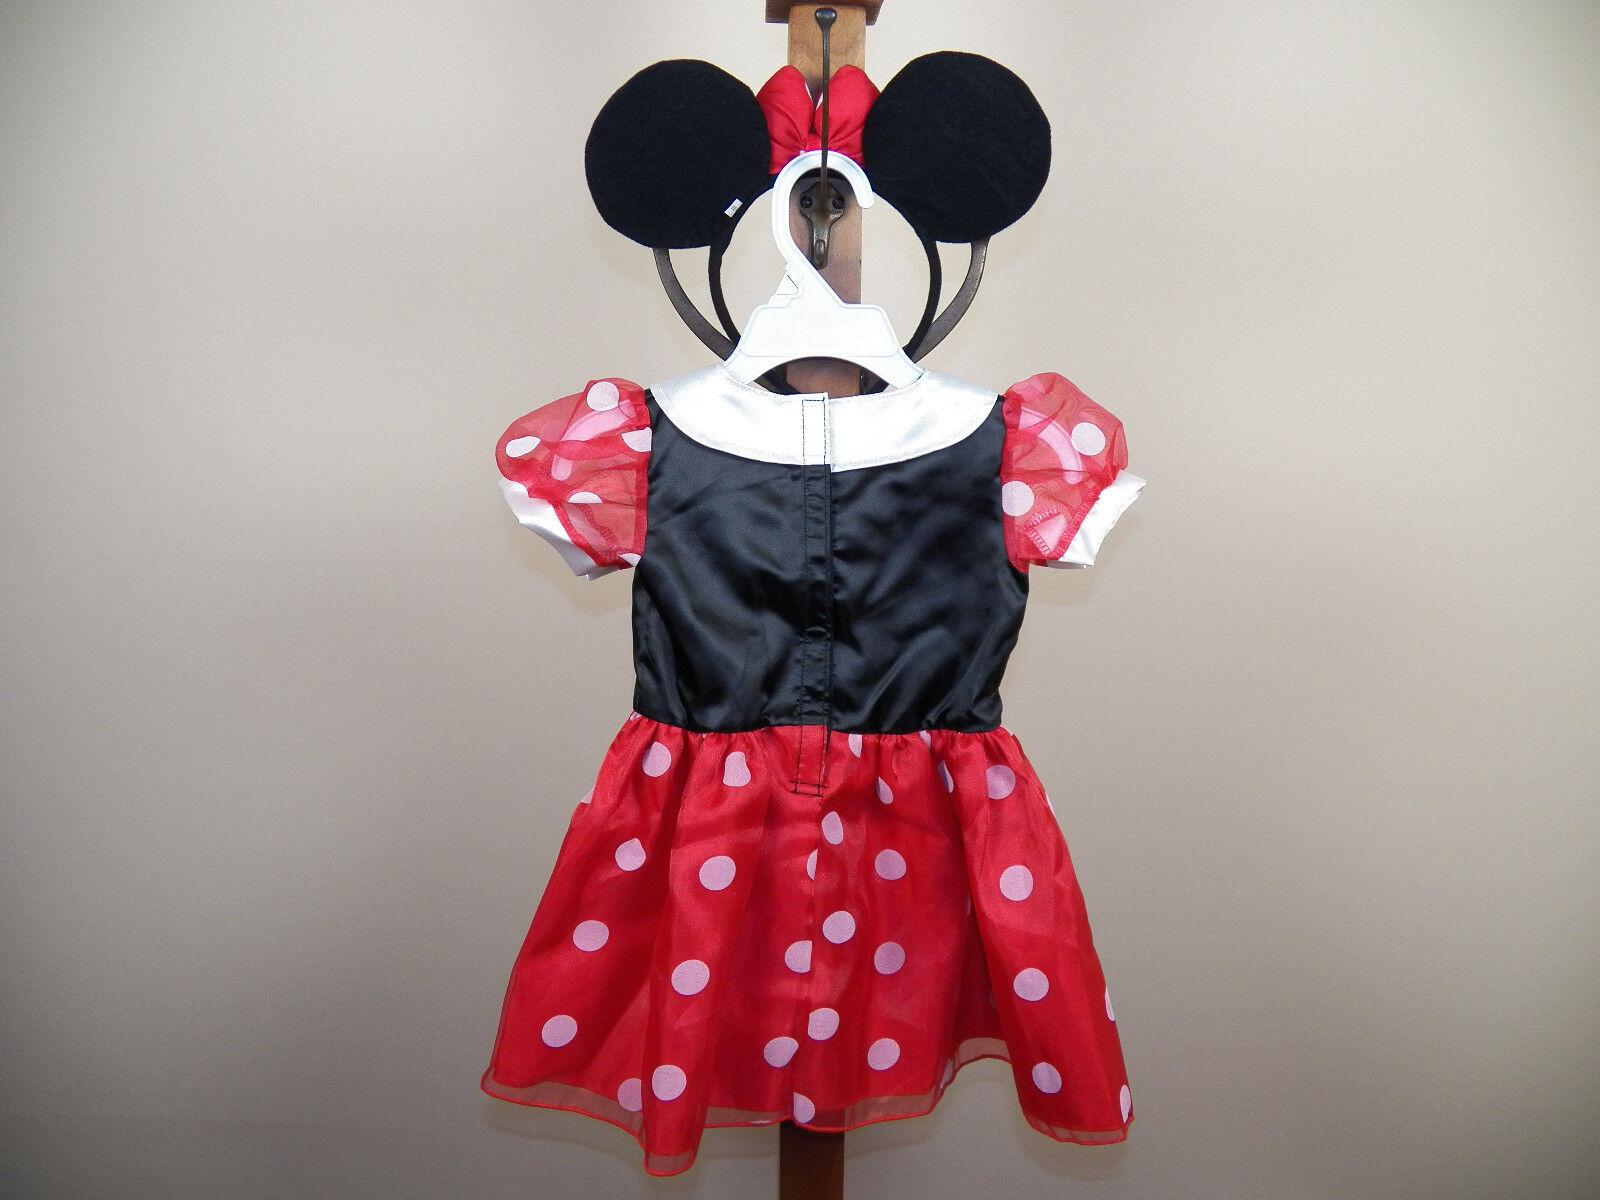 disney baby minnie mouse halloween costume size 3/6m, 6/9m, 12/18m